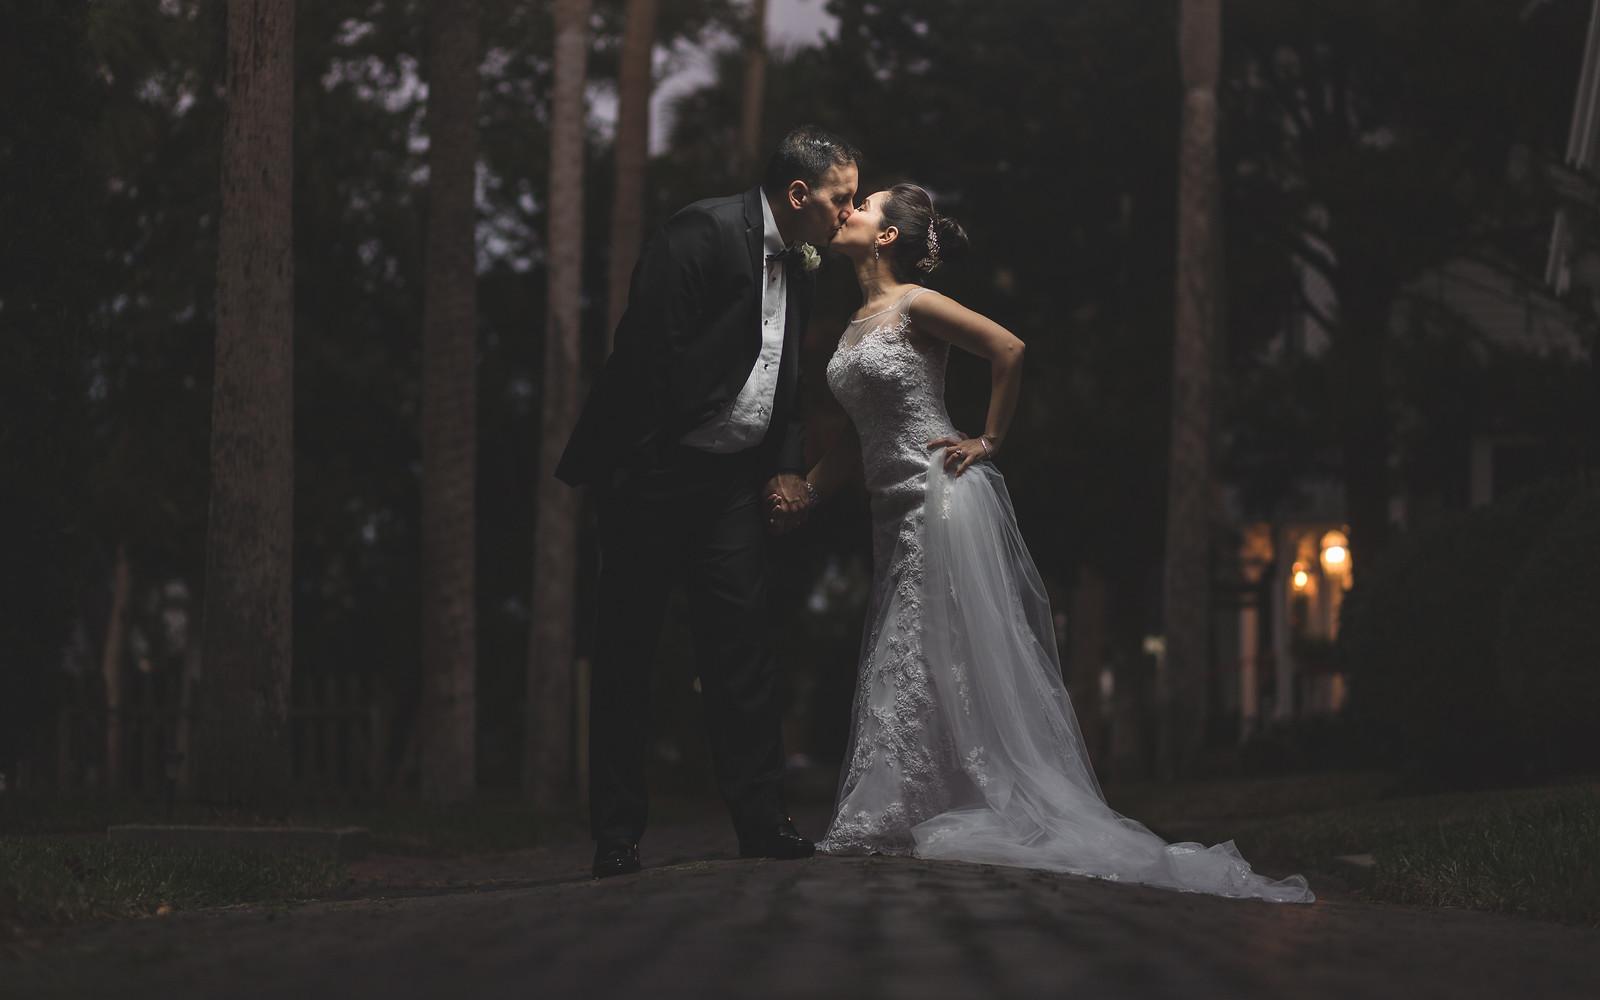 adam-szarmack-st-augustine-wedding-photographer-56.jpg